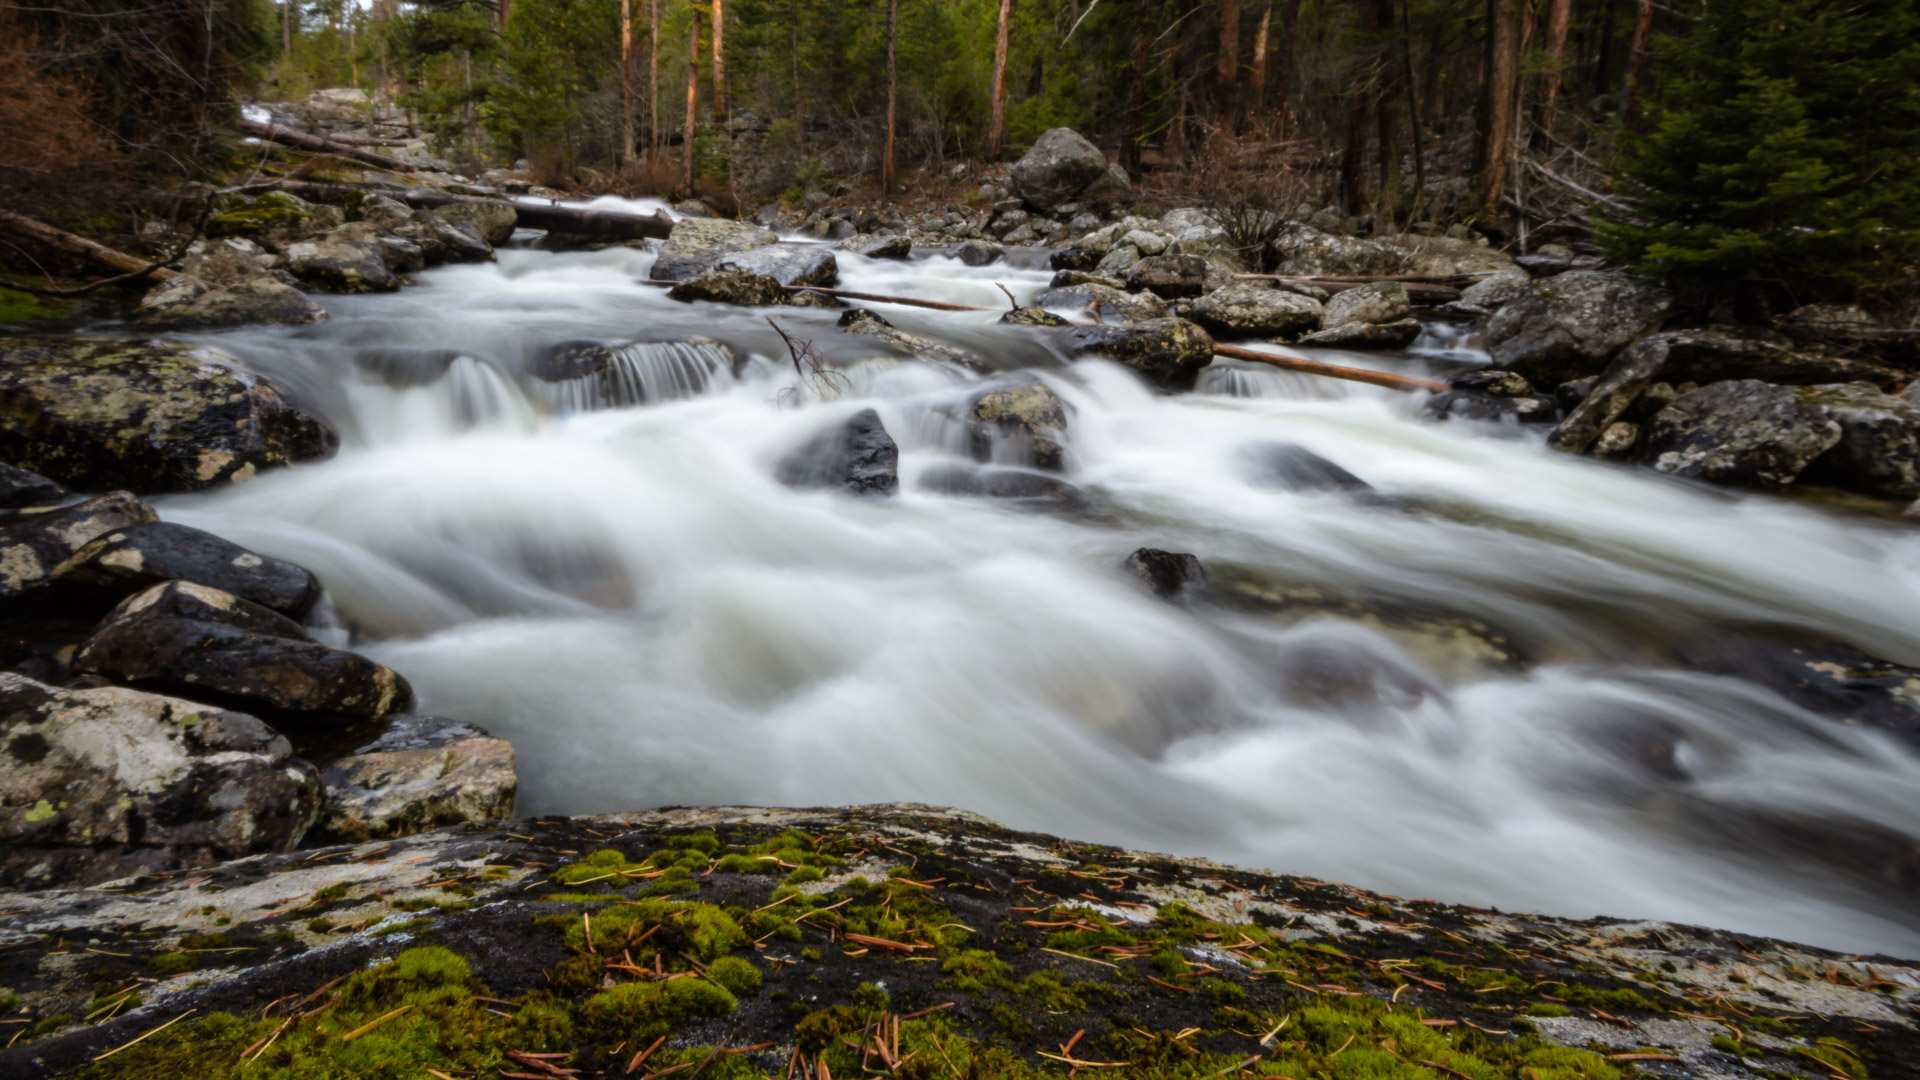 Bear Creek continues to cascade below the falls